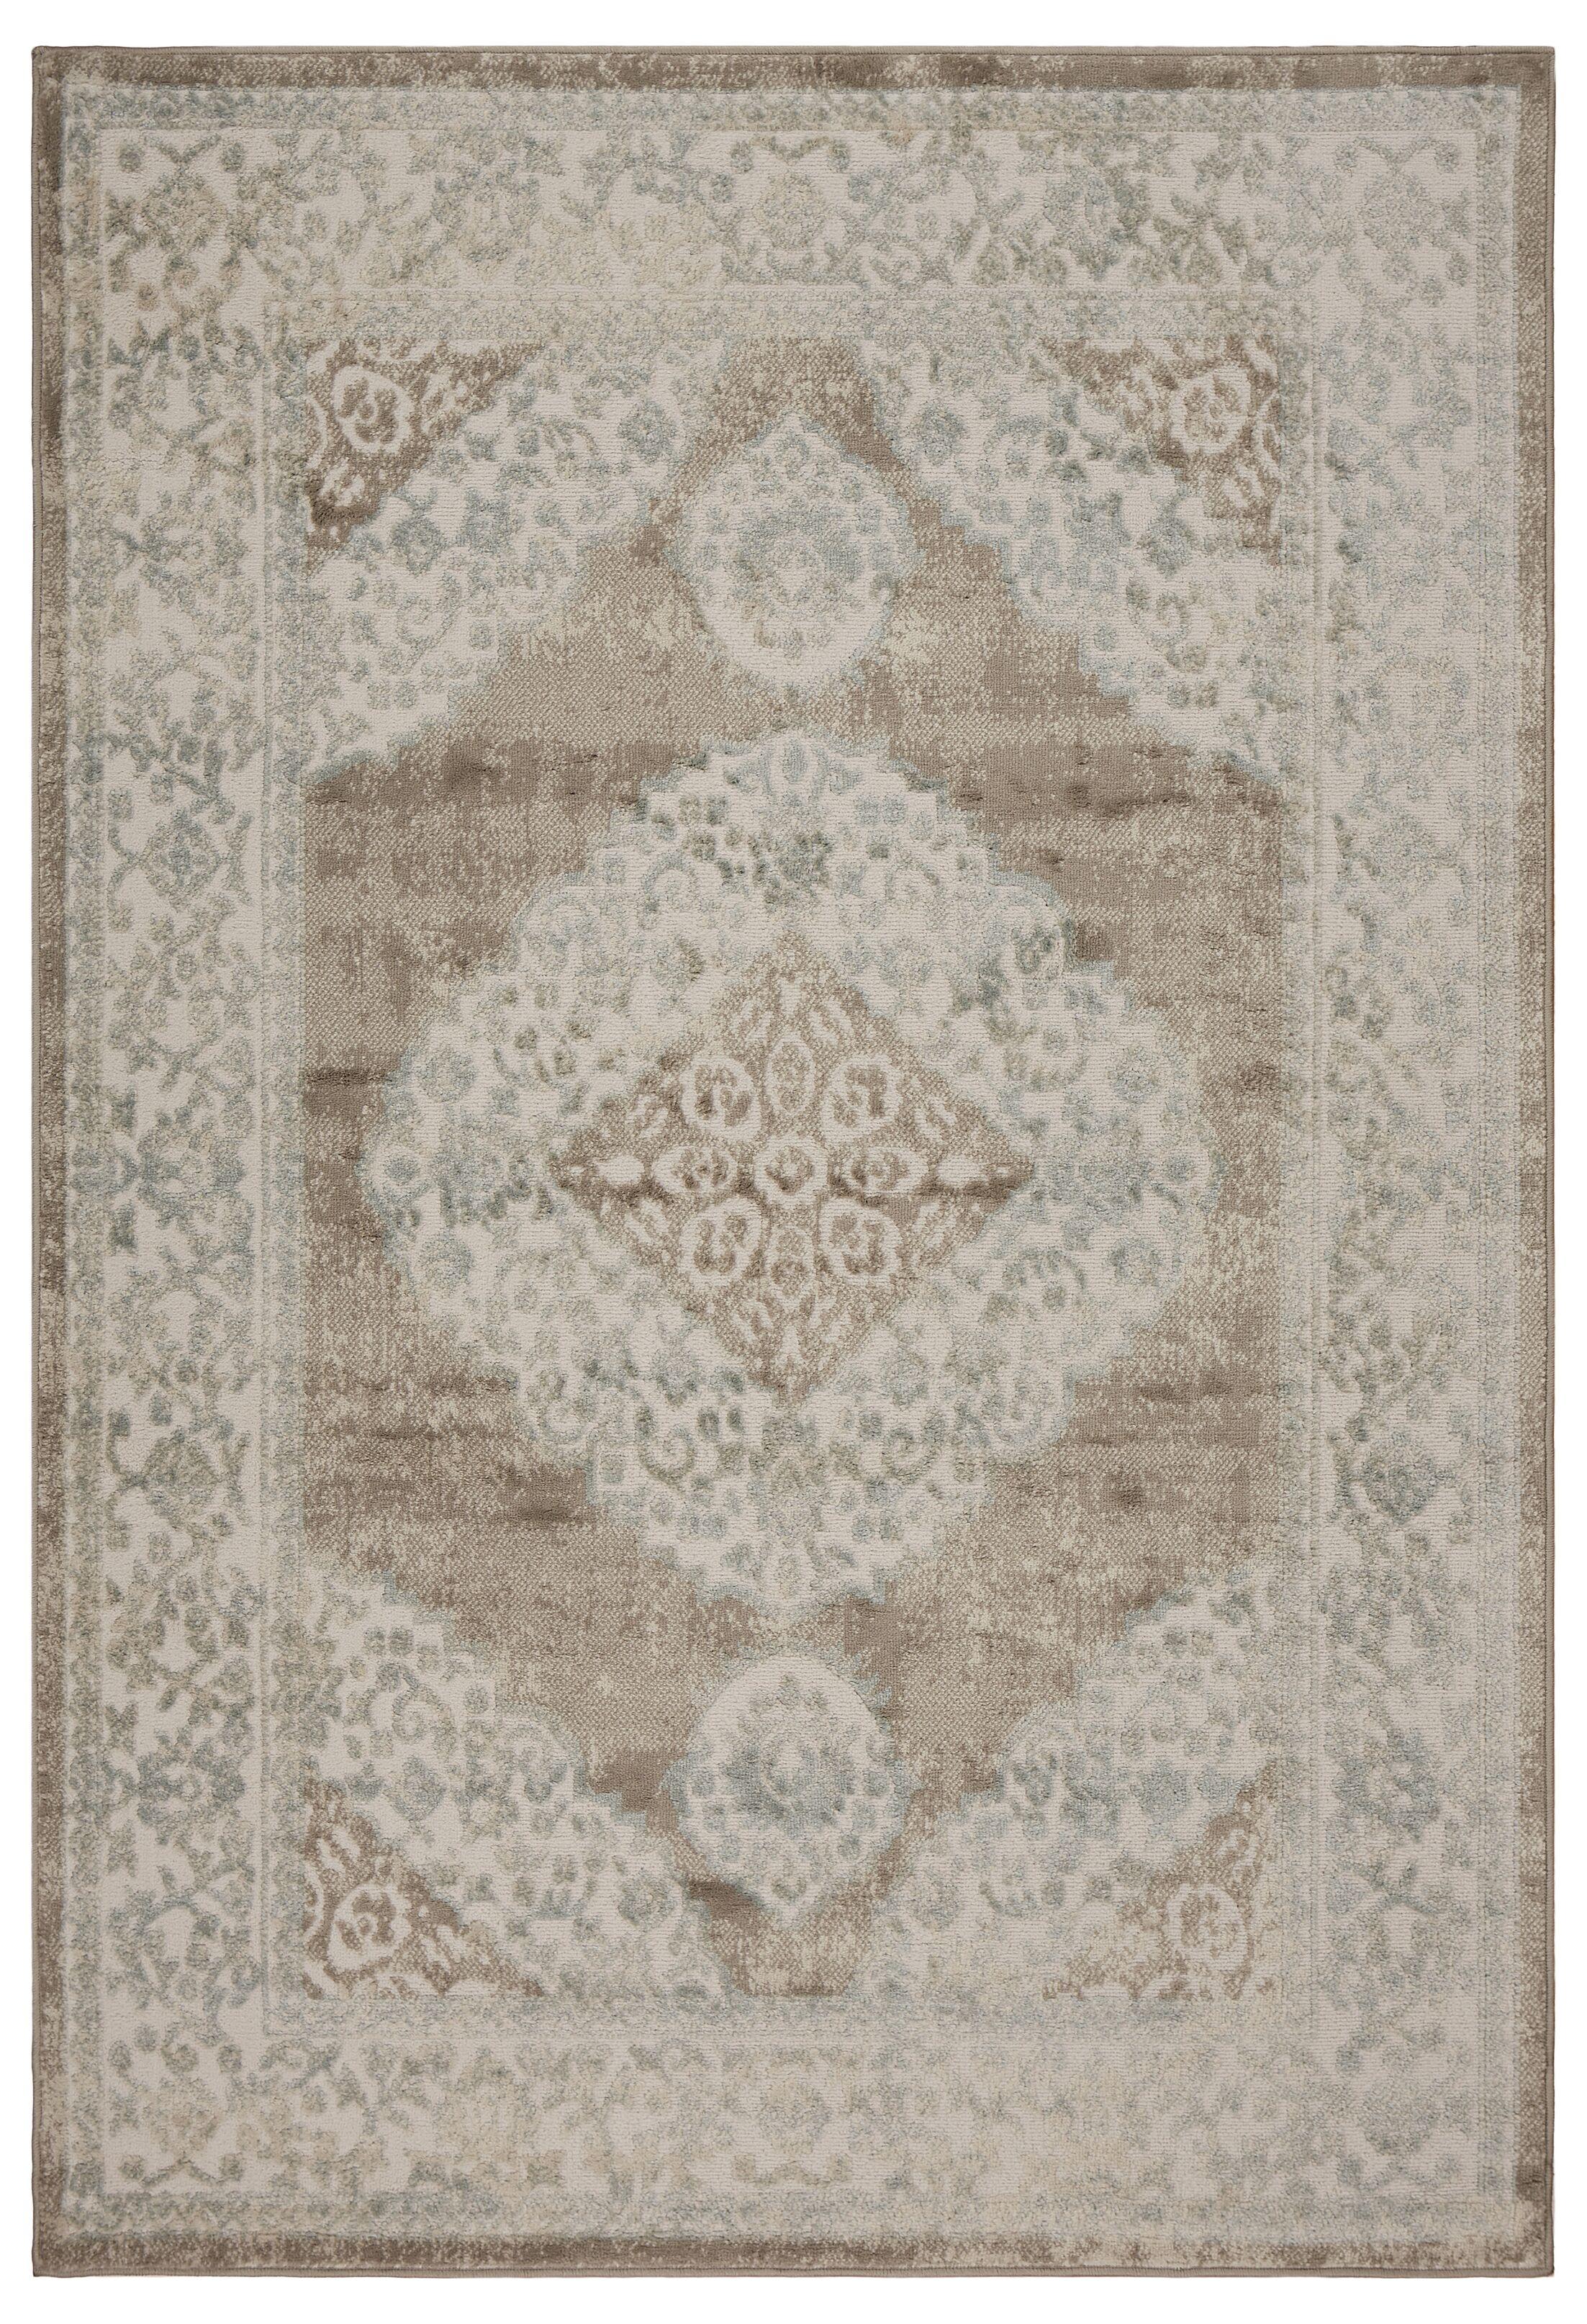 Archimbald Elegance Beige Area Rug Rug Size: Rectangle 5' x 7'